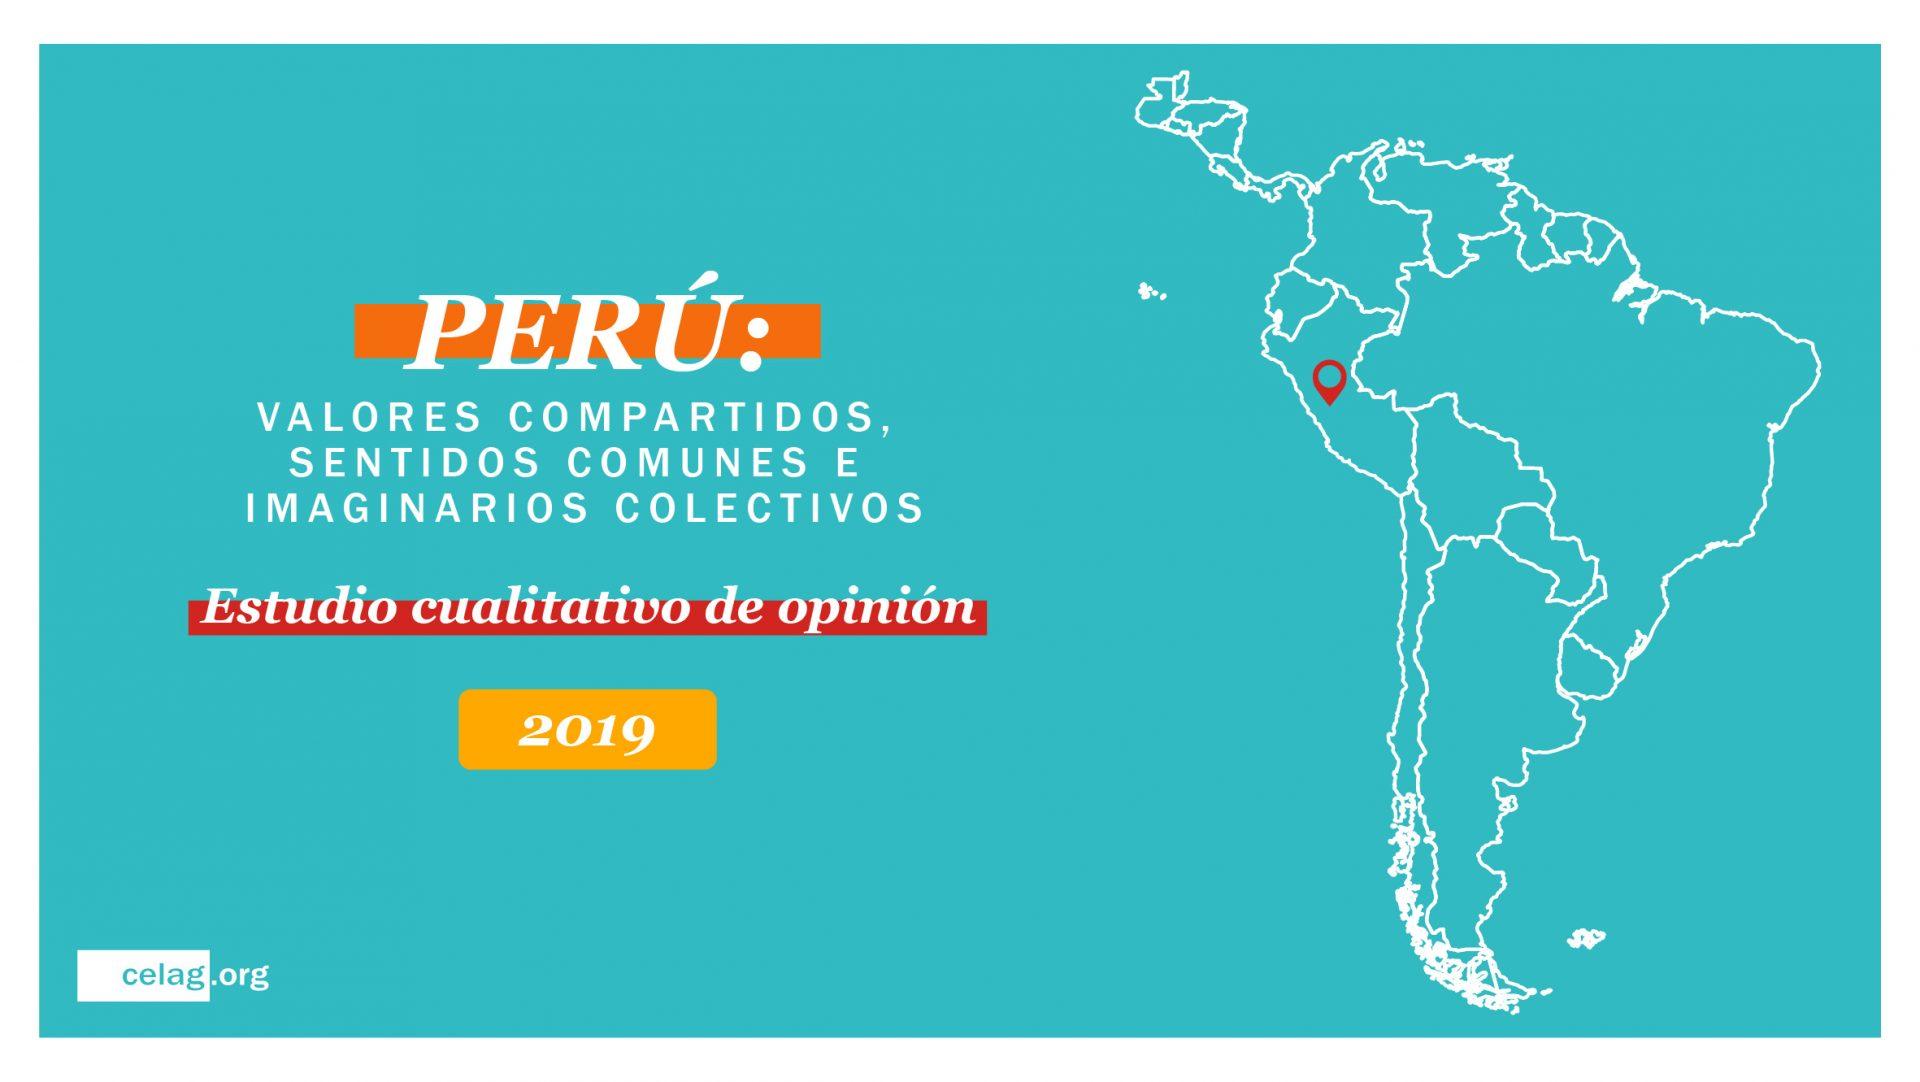 Estudio cualitativo de opinión. Perú, valores compartidos, sentidos comunes e imaginarios colectivos